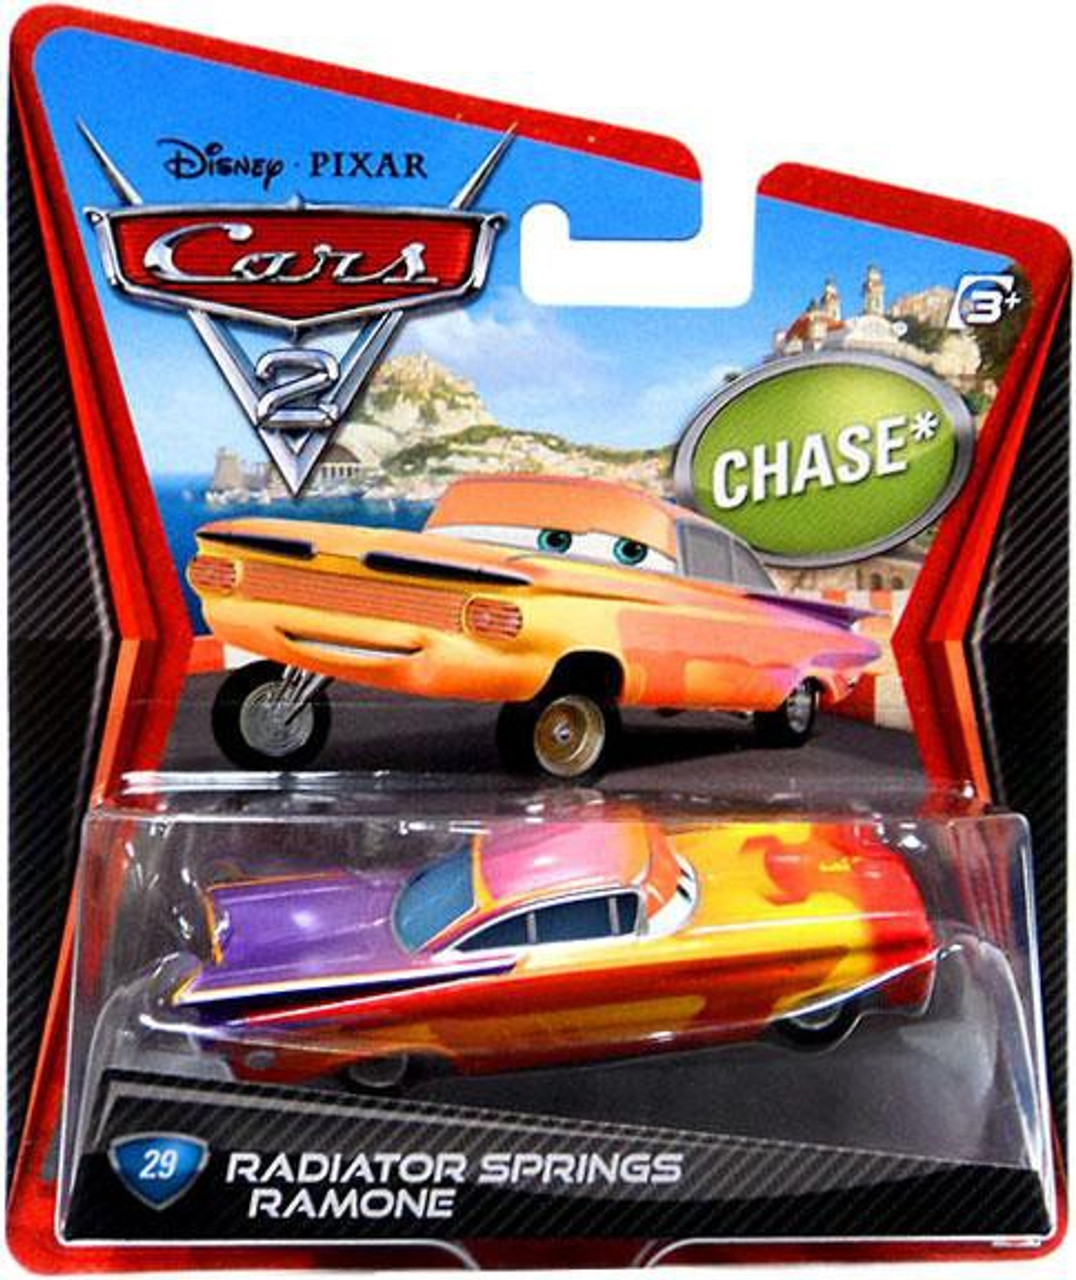 Disney Pixar Cars Cars 2 Main Series Radiator Springs Ramone 155